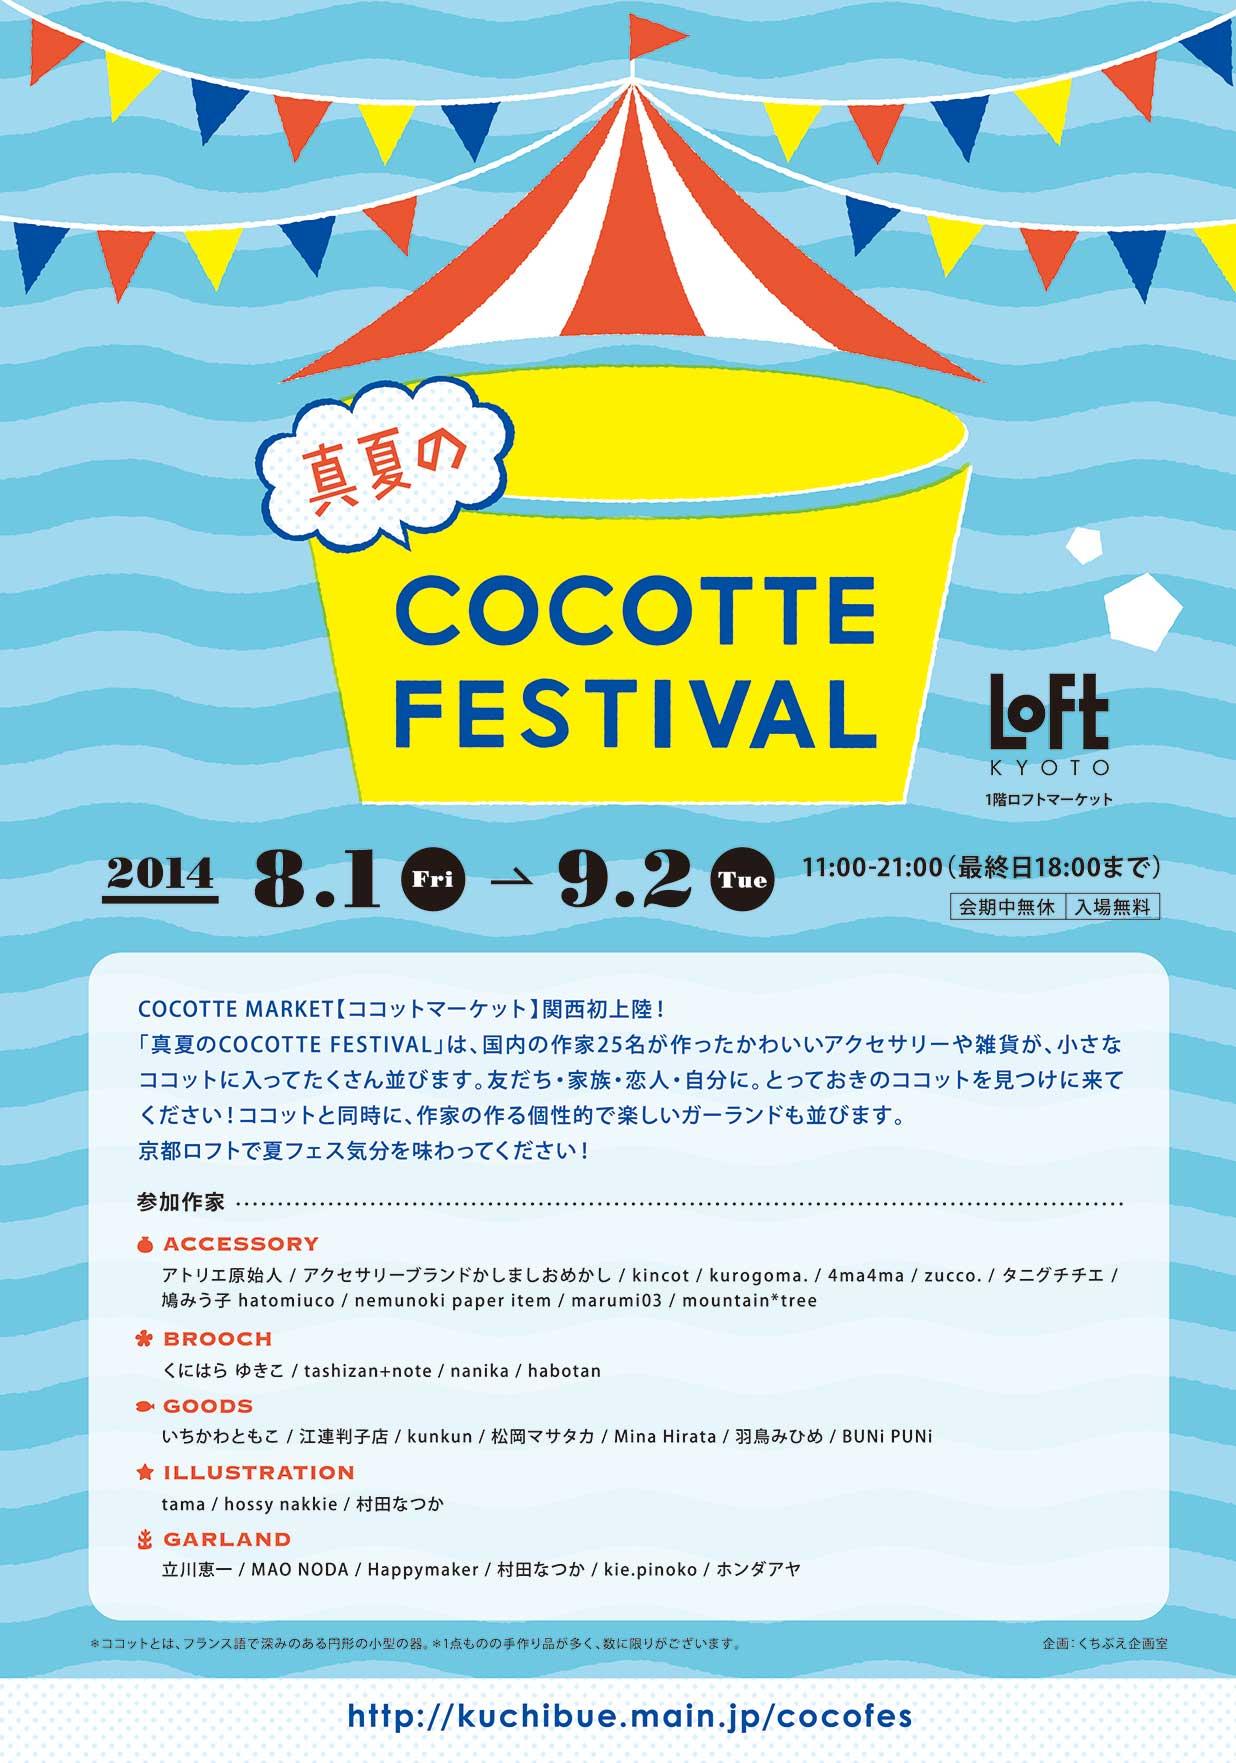 8/1~9/1 POPBOX 京都 開催のお知らせ!!!_f0010033_1143778.jpg